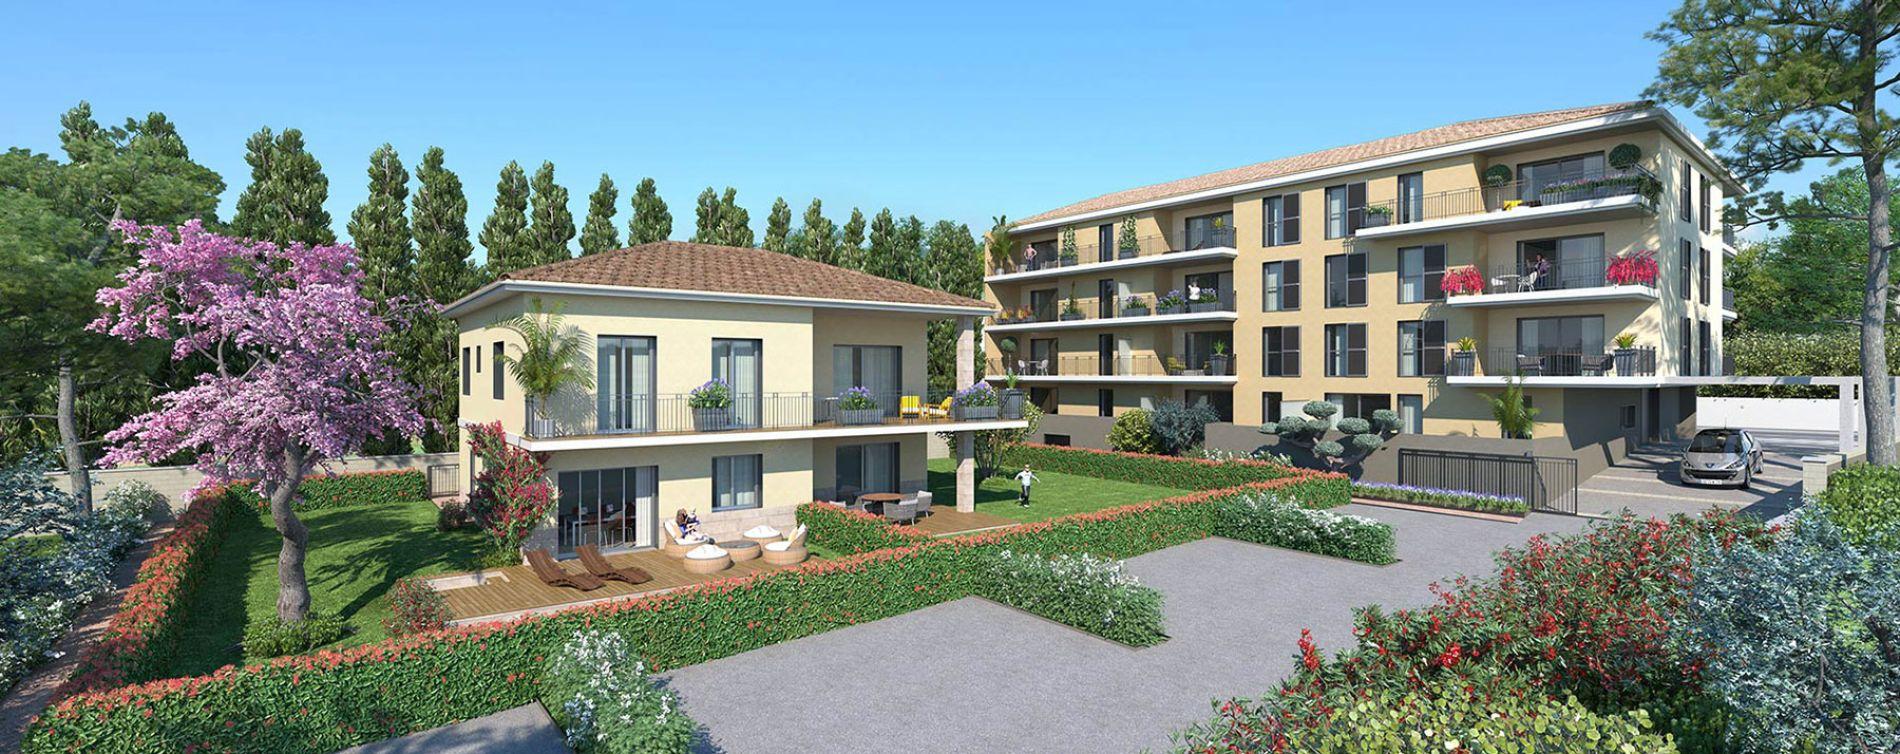 Résidence Villa Edelweiss à Aix-en-Provence